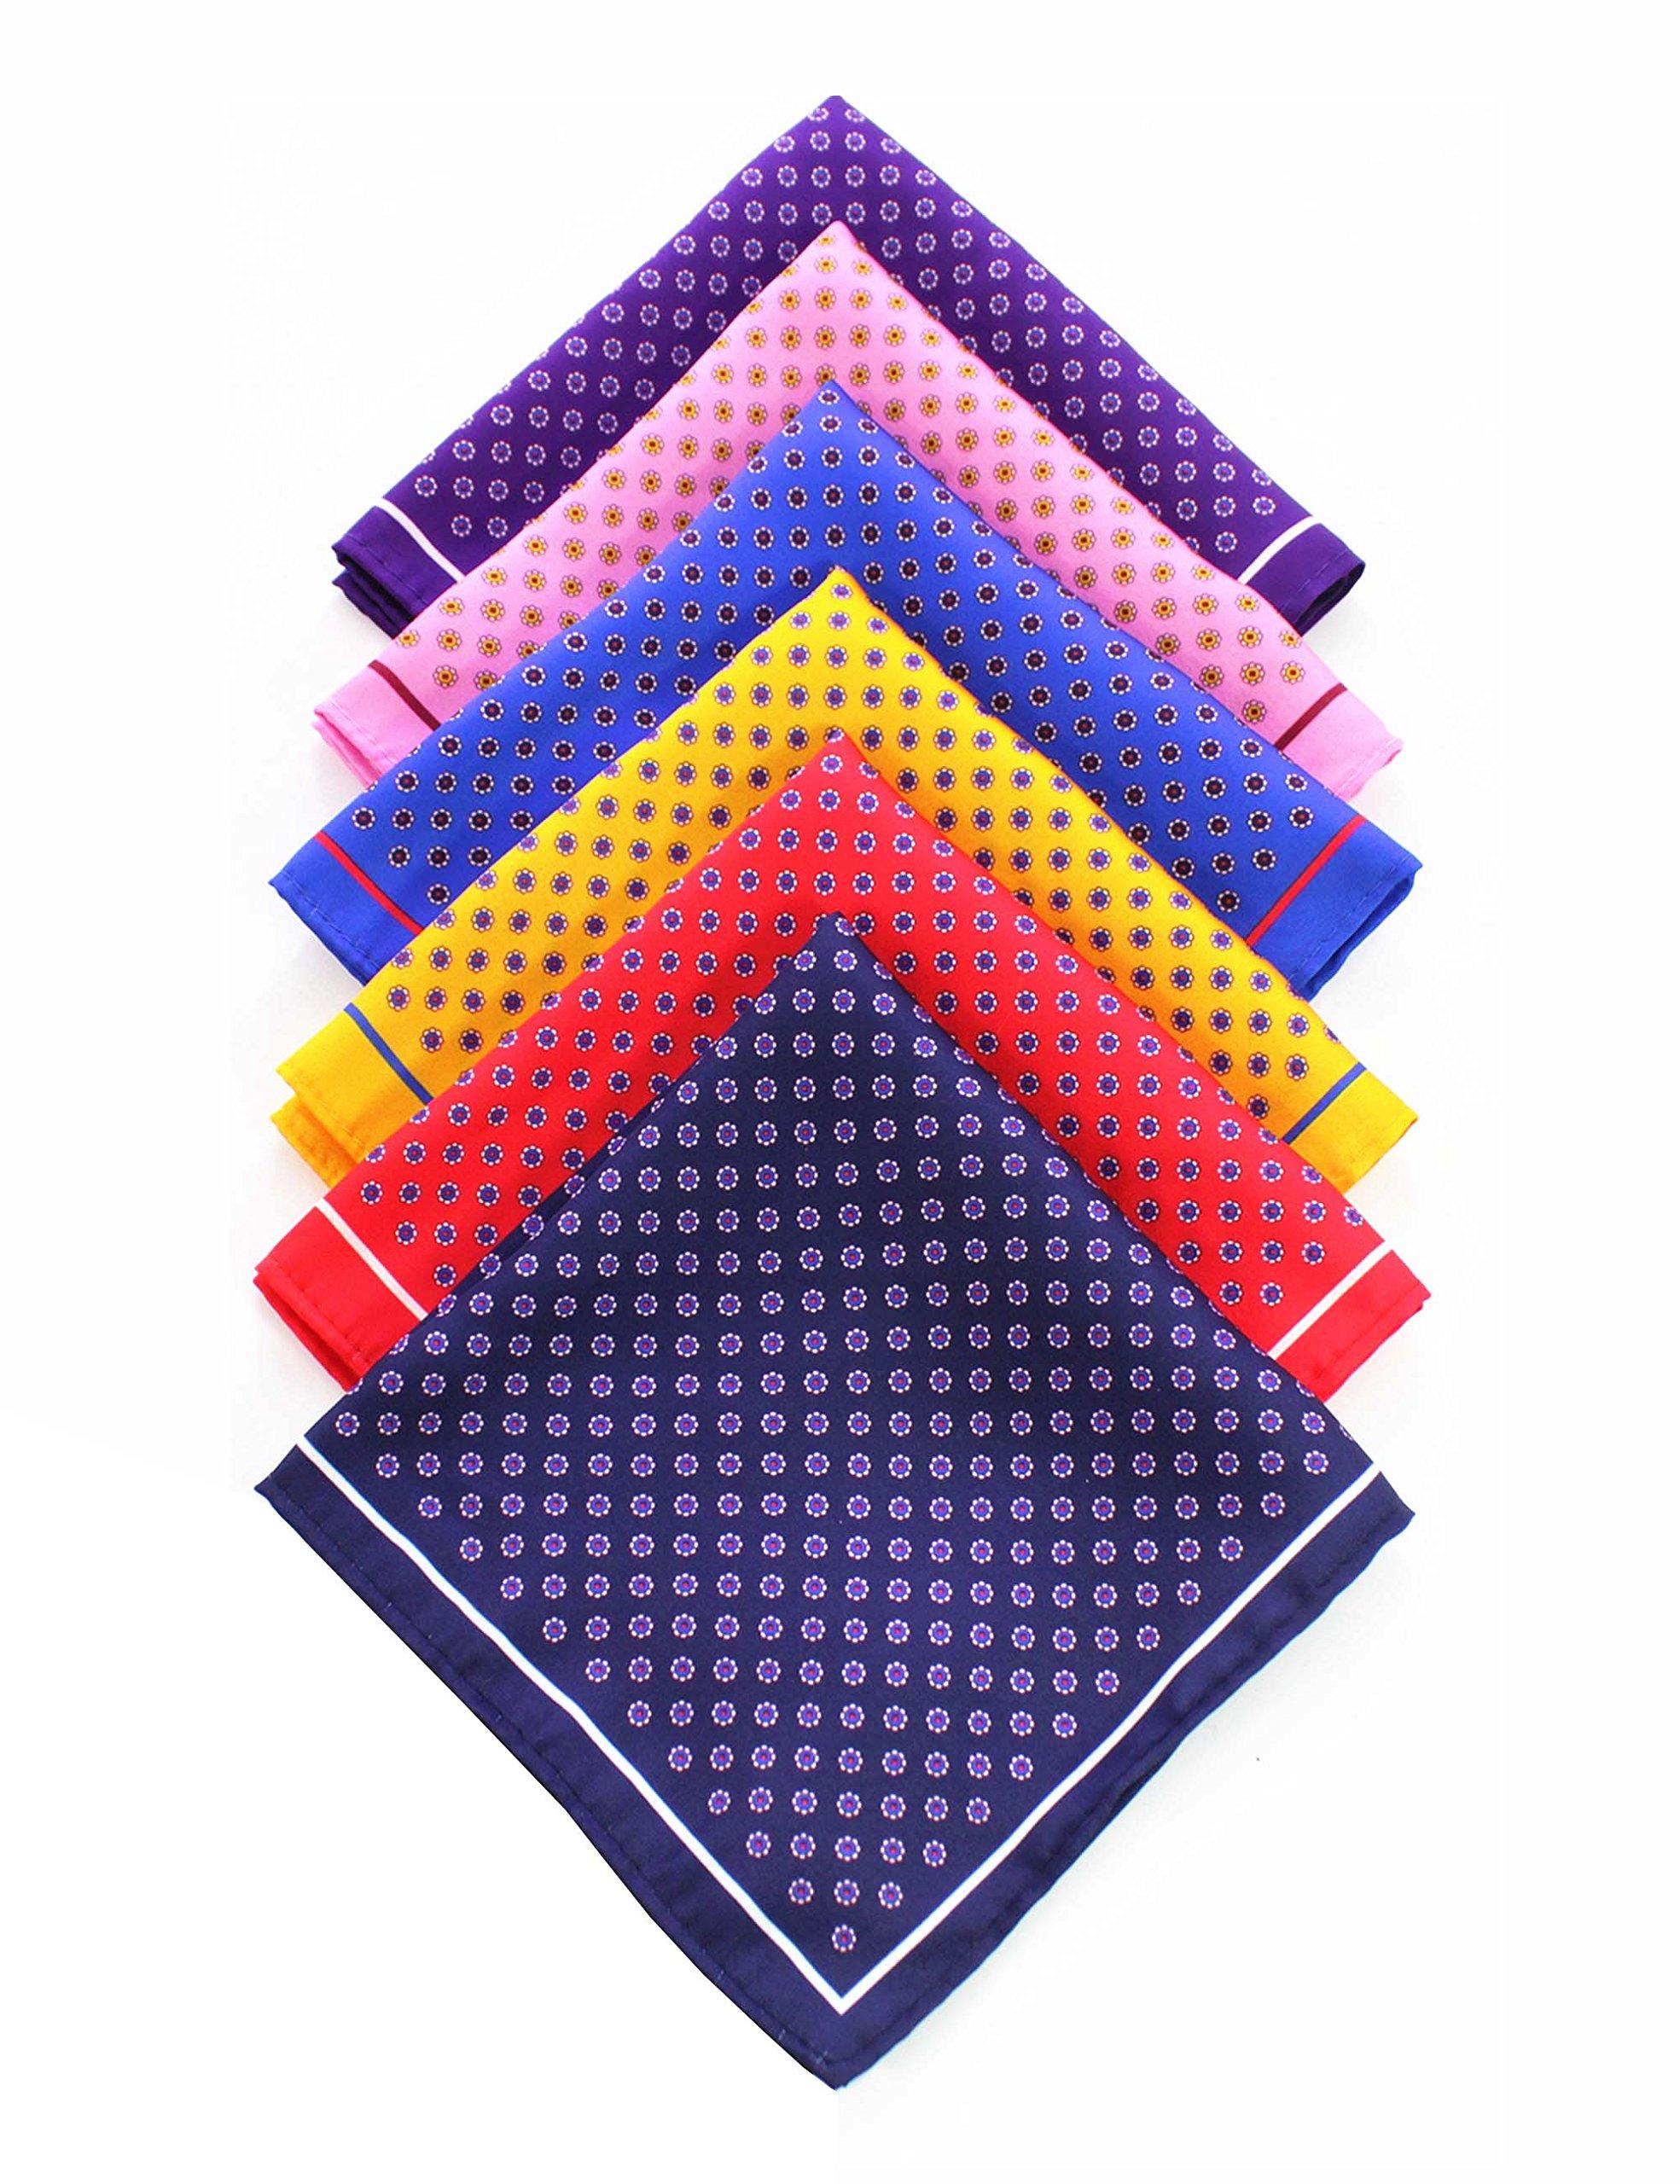 JEMYGINS 6PCS Red Yellow Pink Blue Silk Pocket Squares for Men Handkerchief Hanky Set (1)